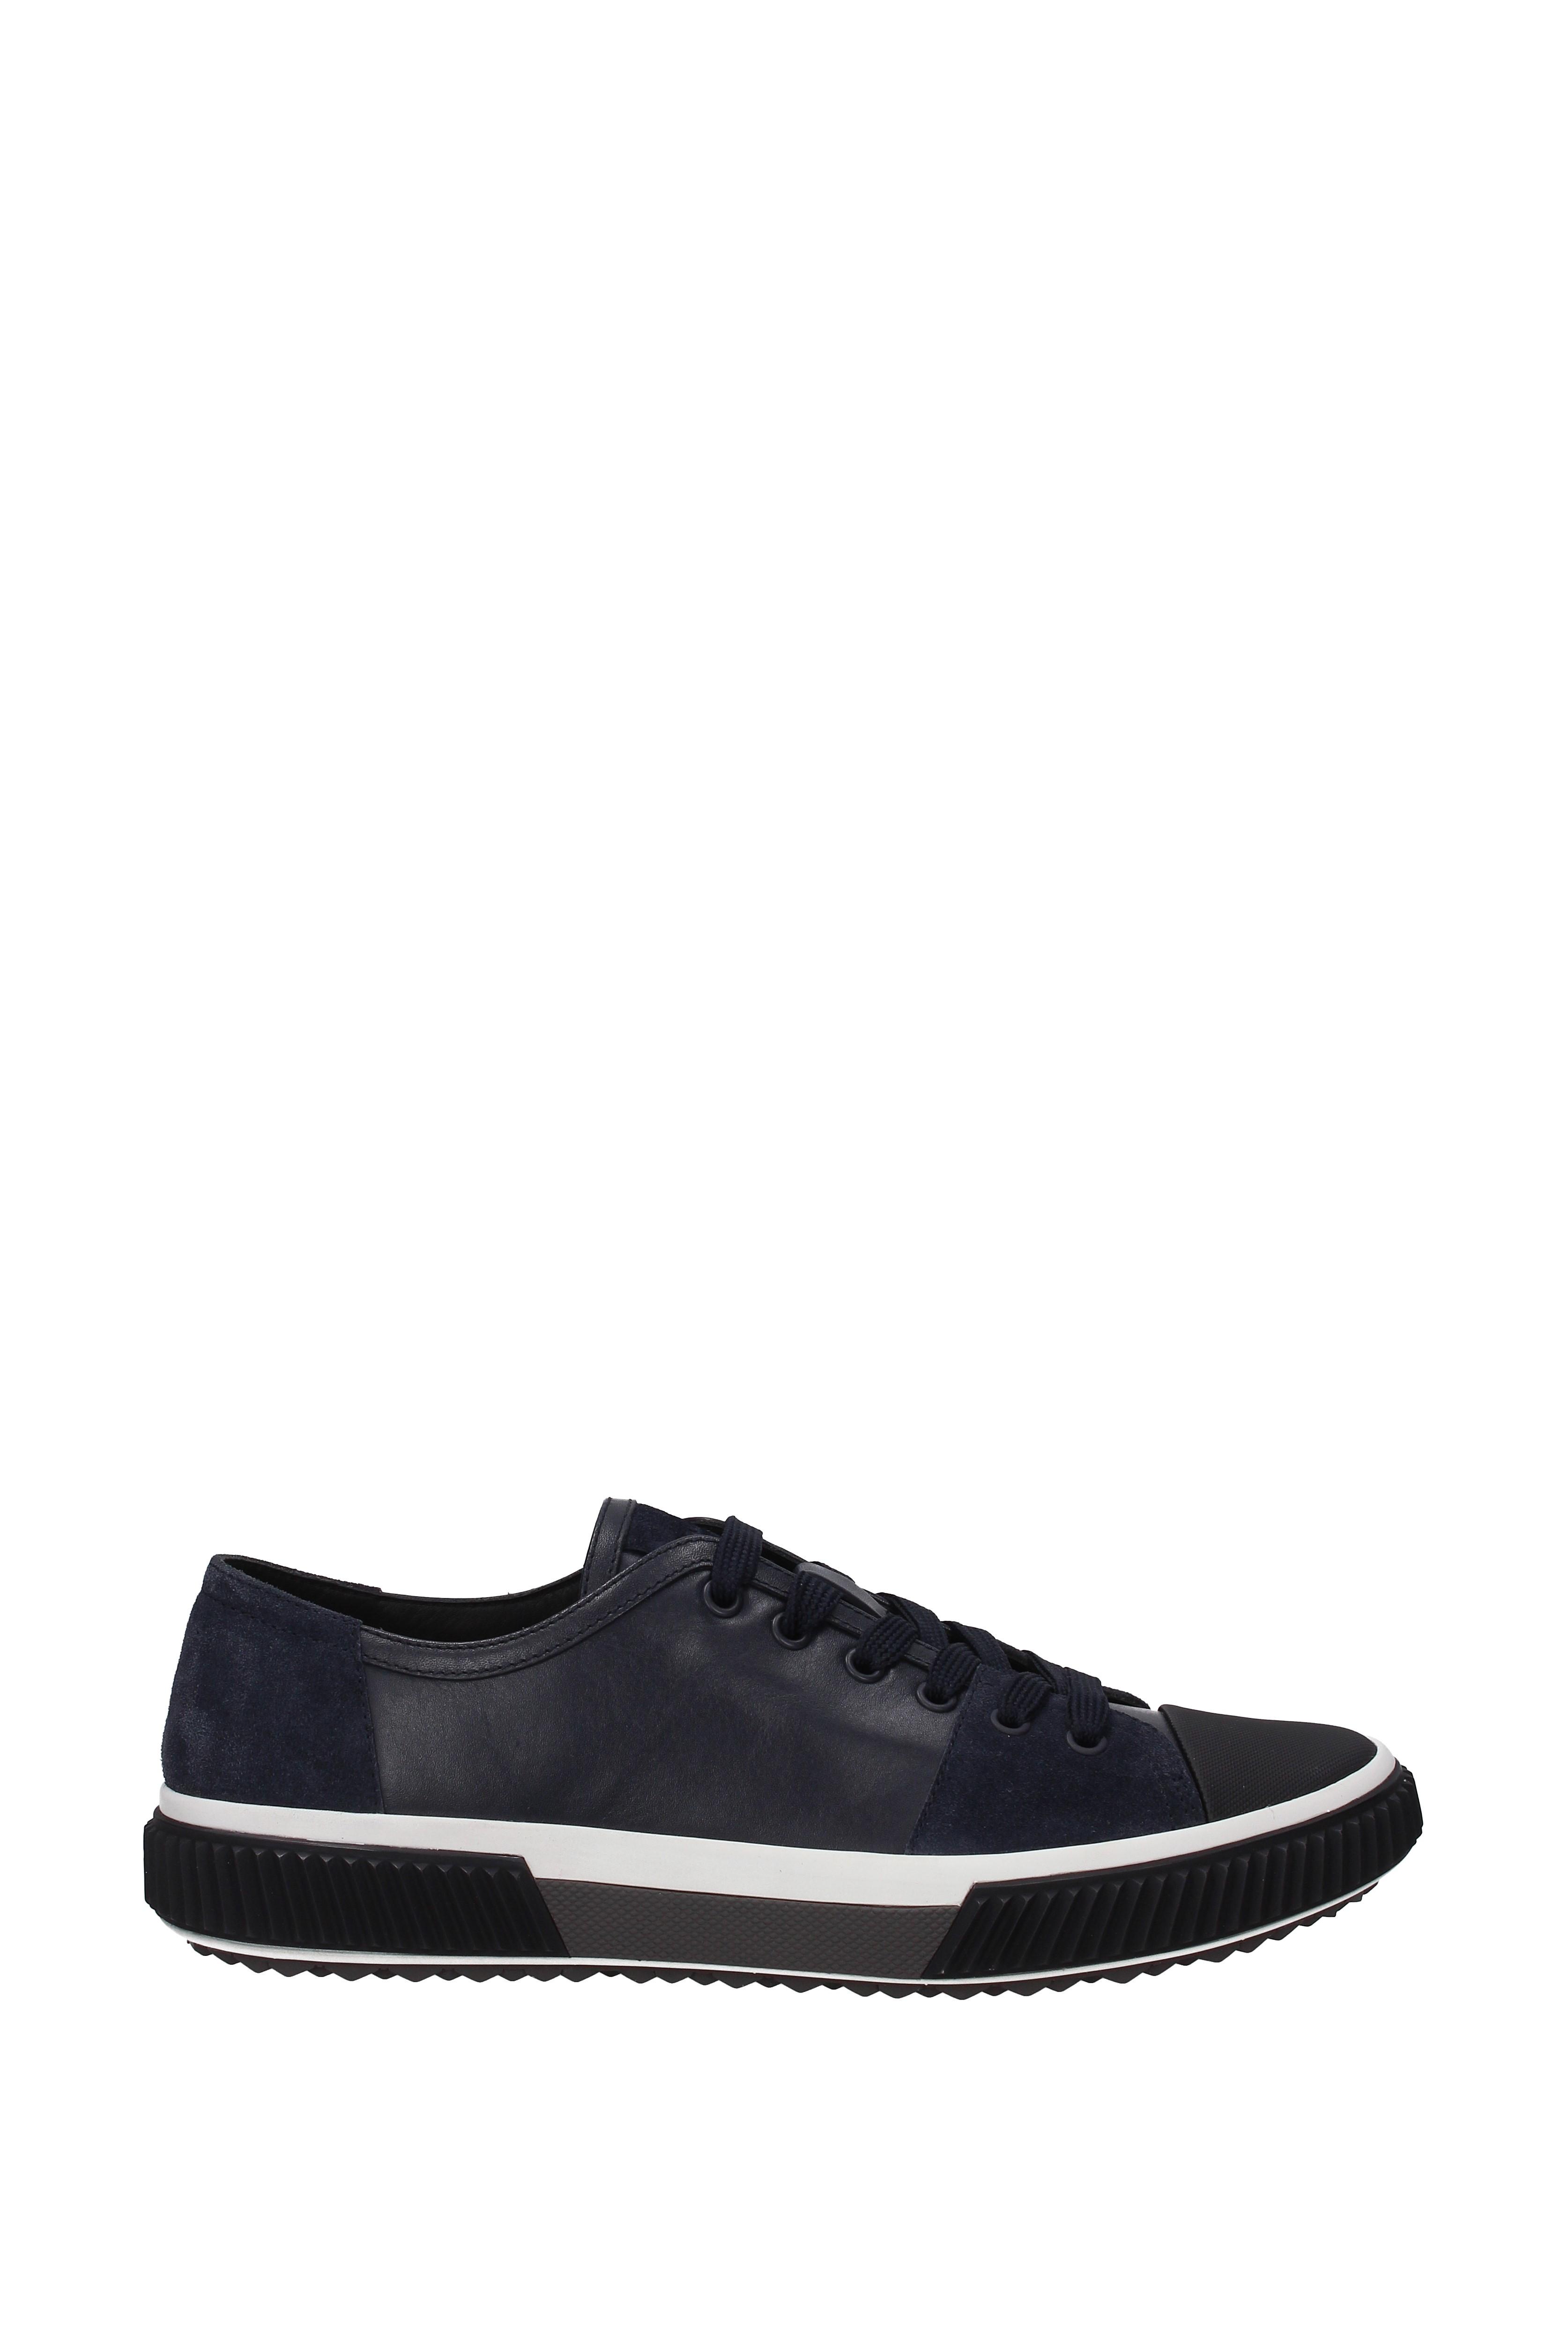 Sneakers-Prada-Uomo-Pelle-4E3058PLUMESCAMOSCI